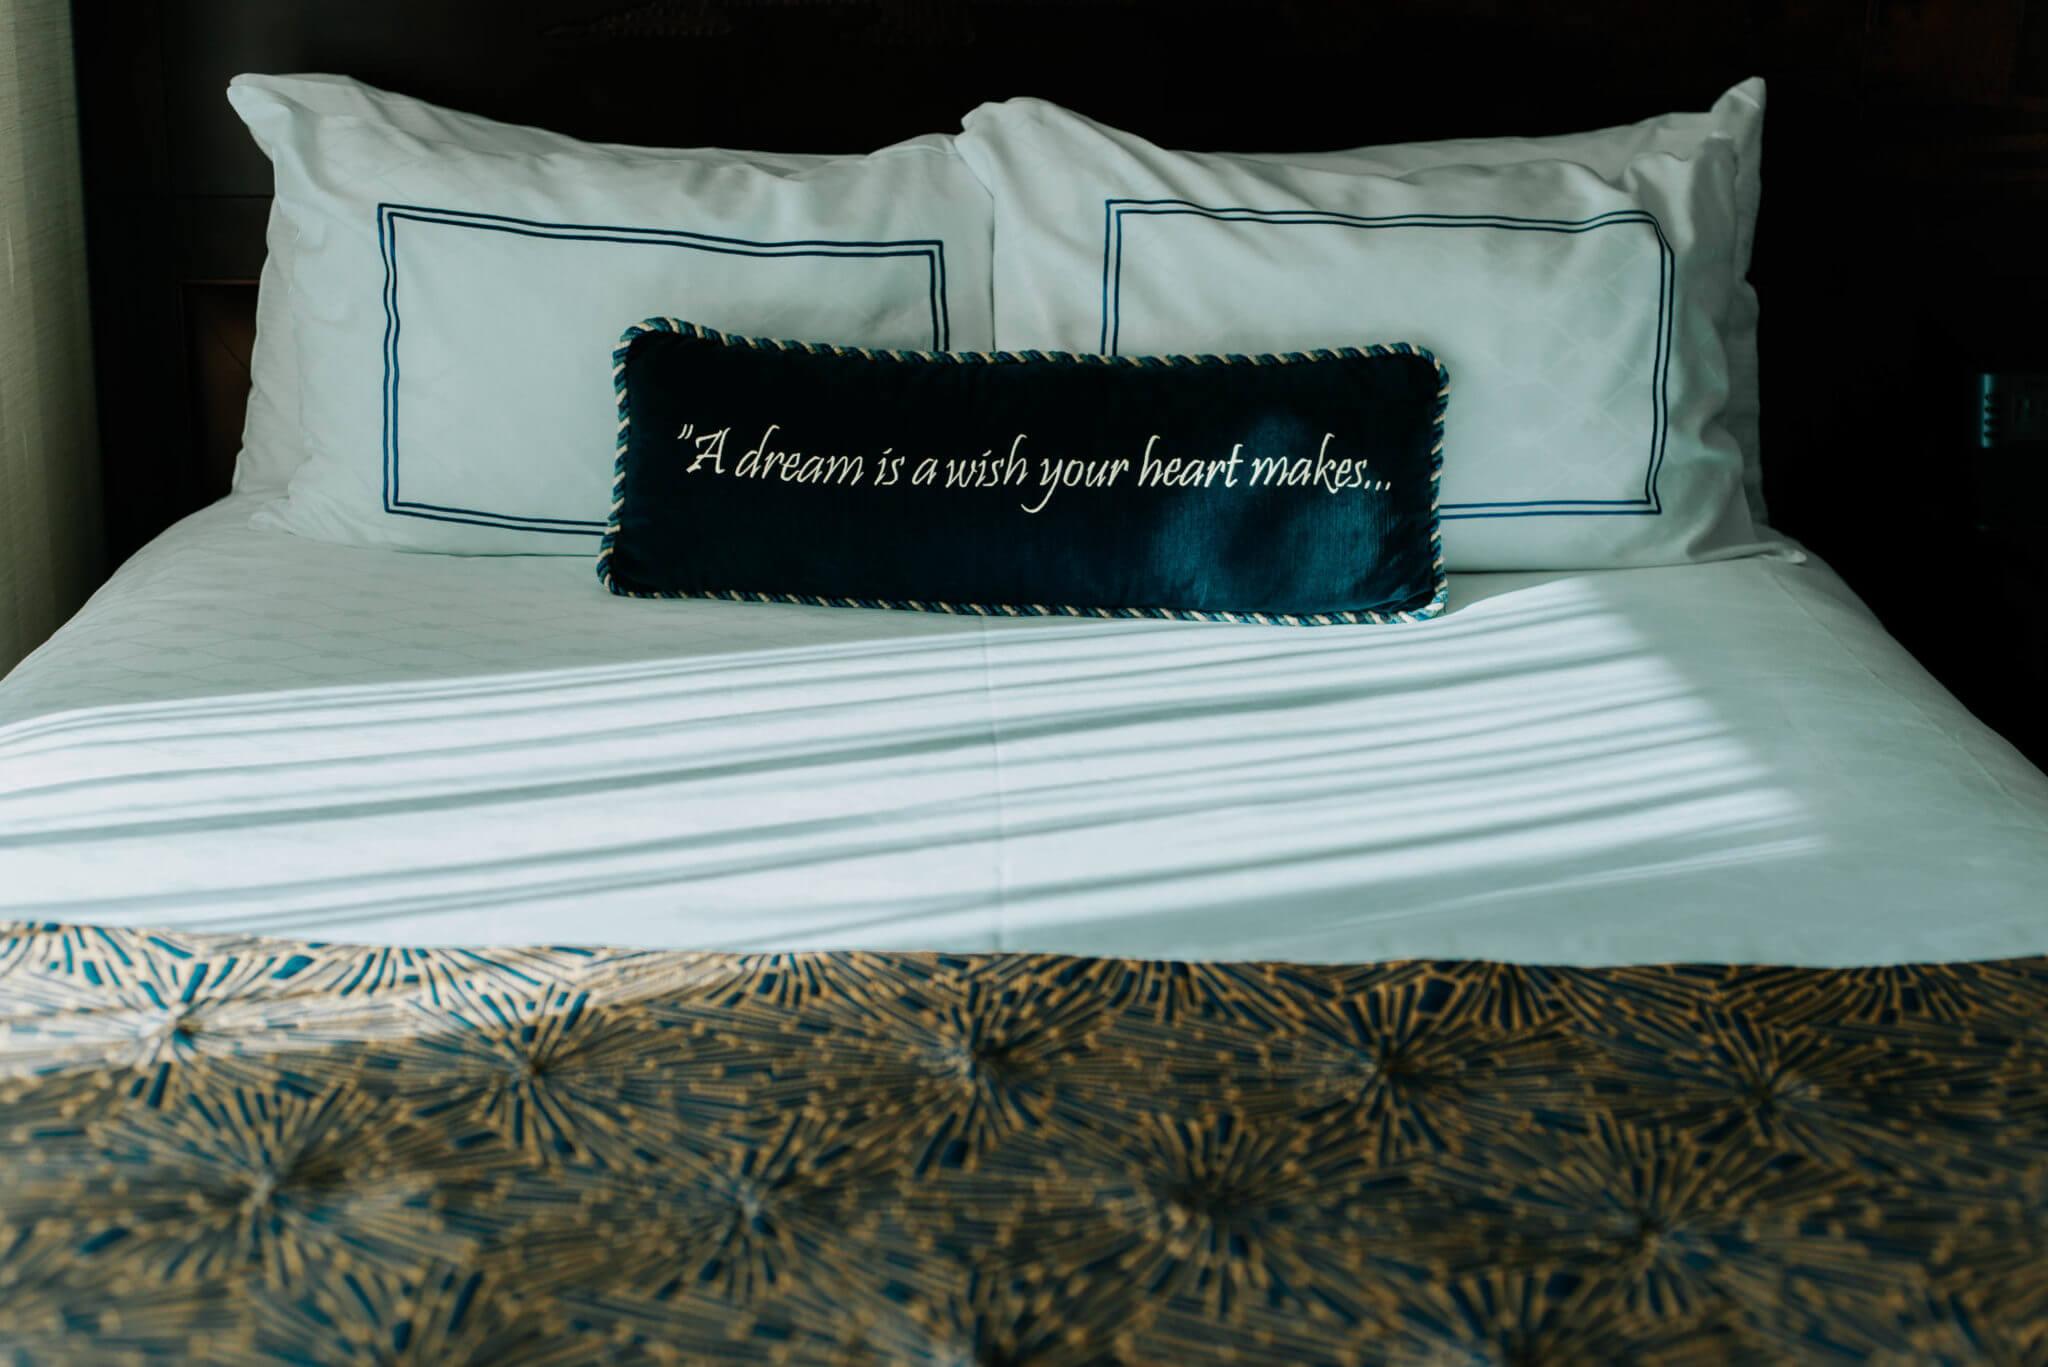 The Disneyland Hotel Room with cinderella pillow